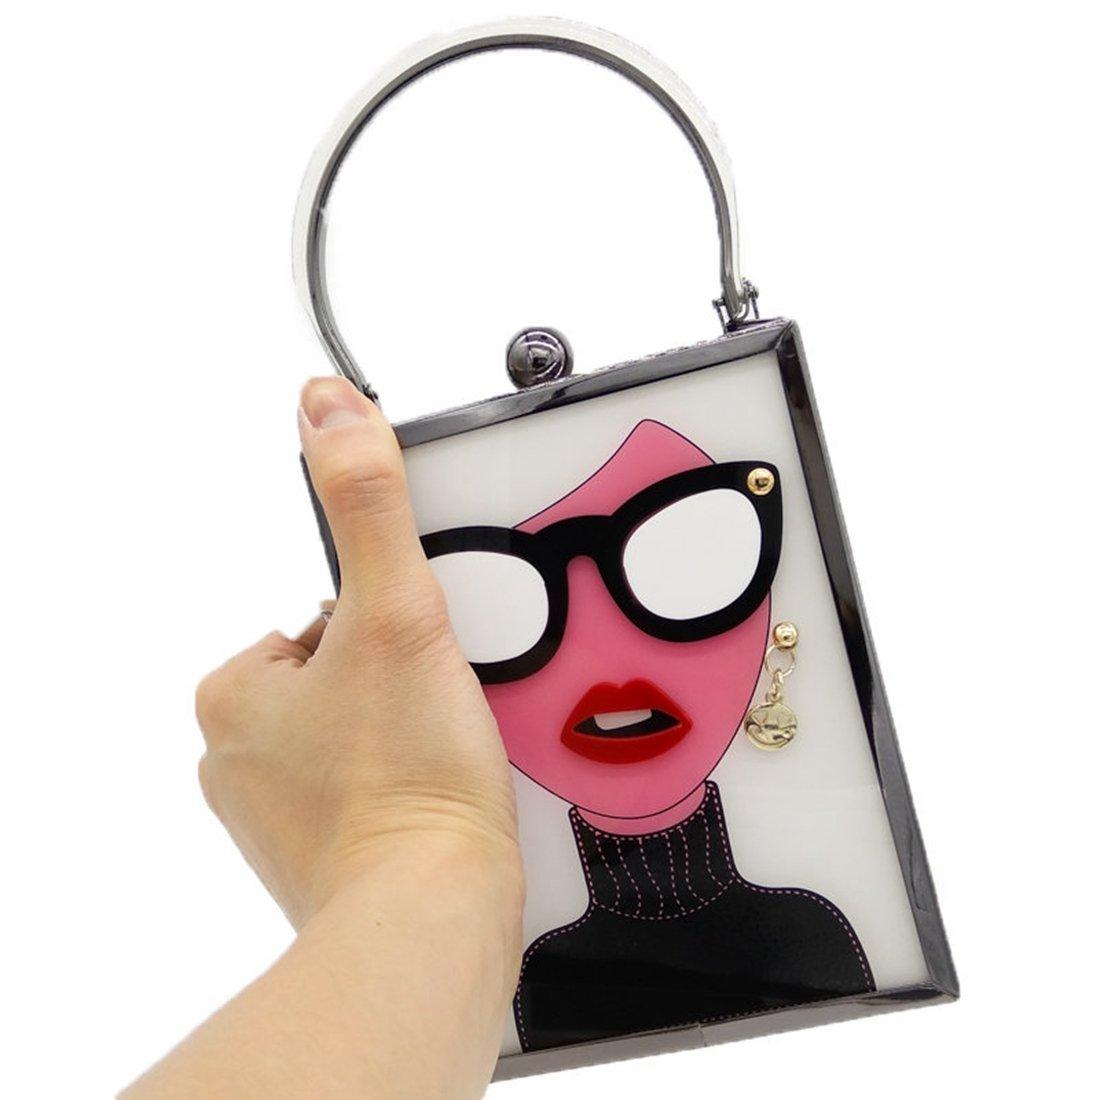 KERVINJESSIE Women Fashion Acrylic Evening Purse Glasses Girls Chain Clutch Vintage Party Crossbody Bag (Color : White)